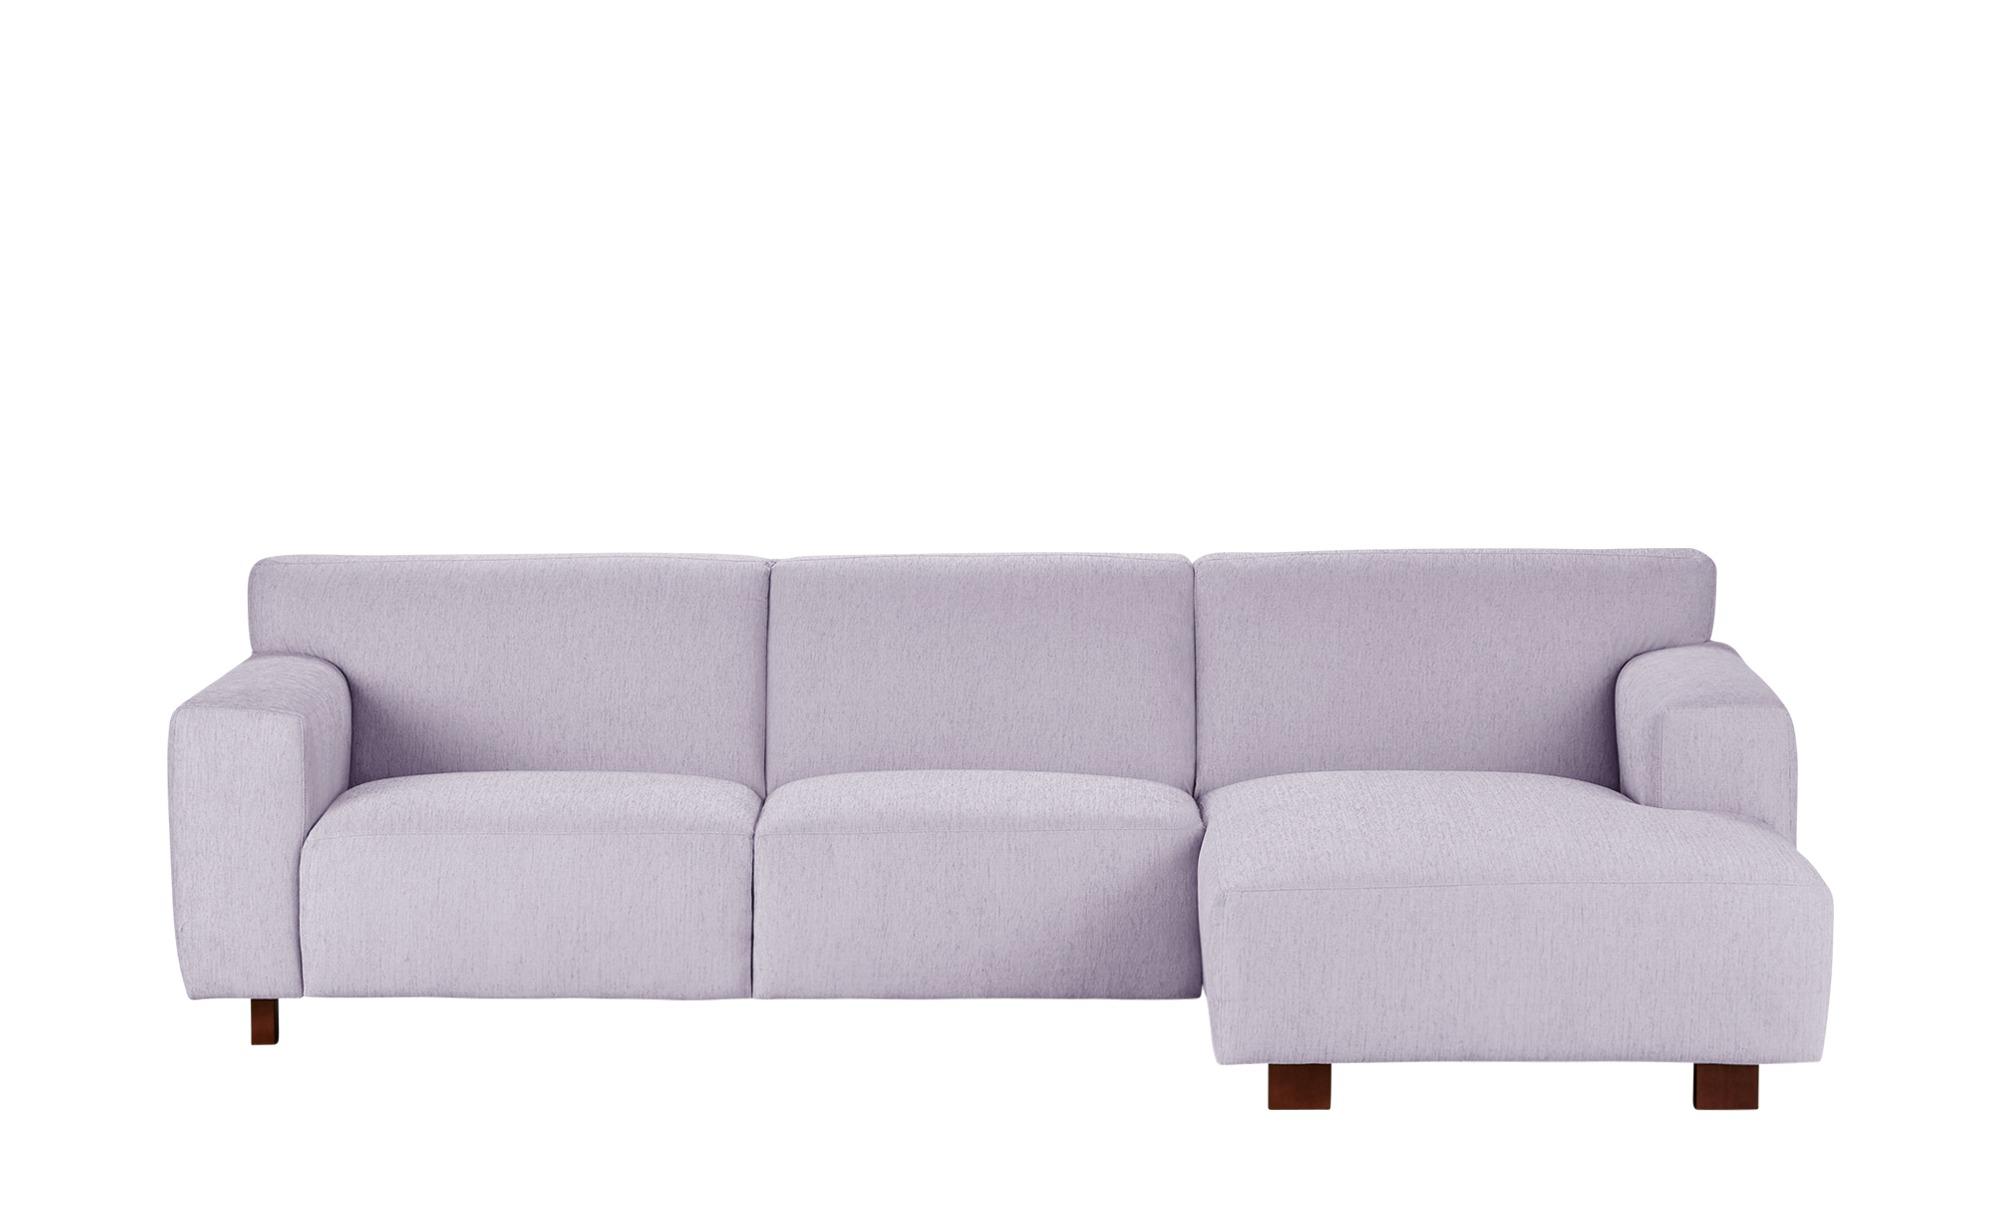 SOHO Ecksofa  Tiana ¦ lila/violett ¦ Maße (cm): H: 77 Polstermöbel > Sofas > Ecksofas - Höffner